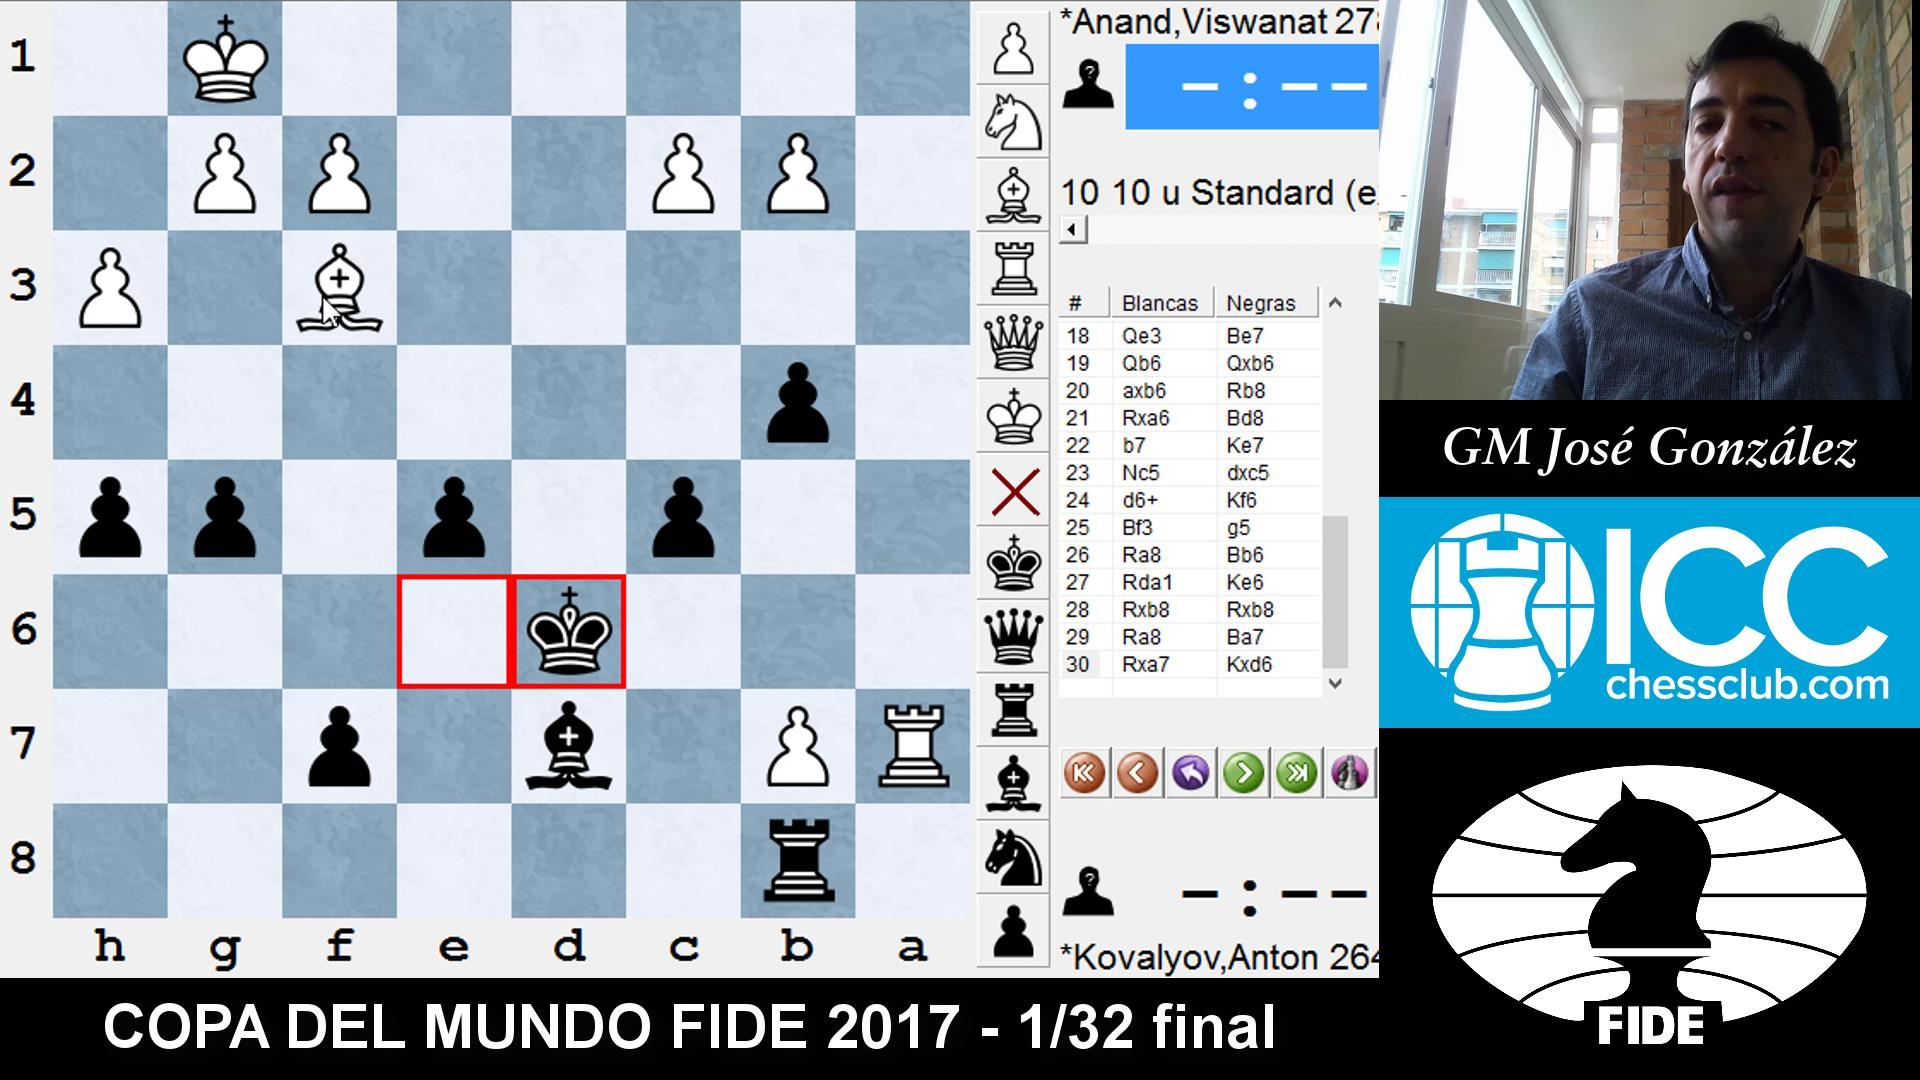 COPA DEL MUNDO FIDE 2017 - Resumen 1/32 final (GM José González)